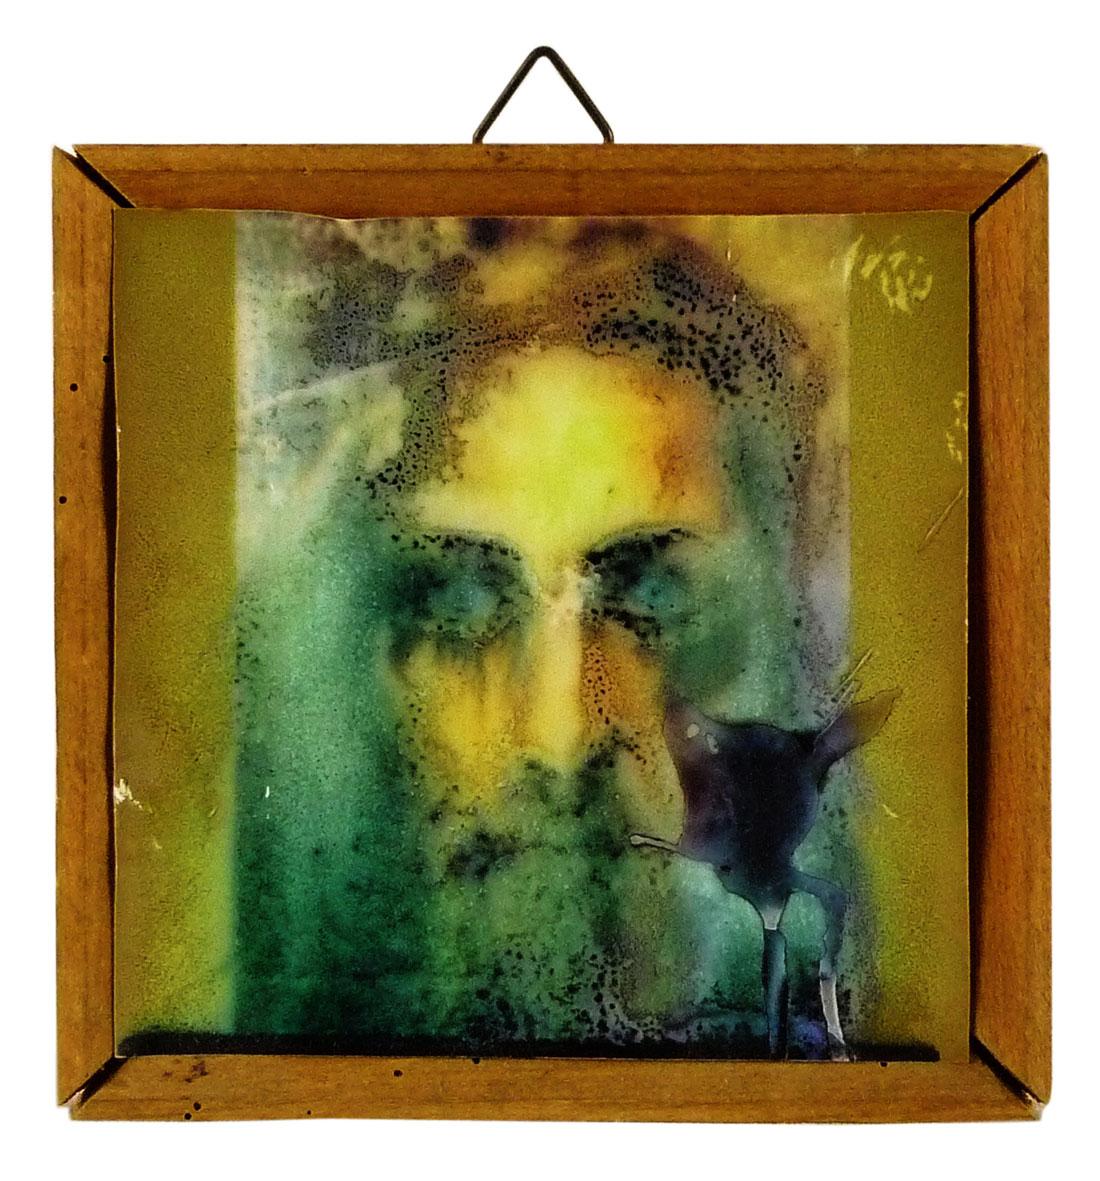 Bild, düsterer Jesus mit Wachspatina